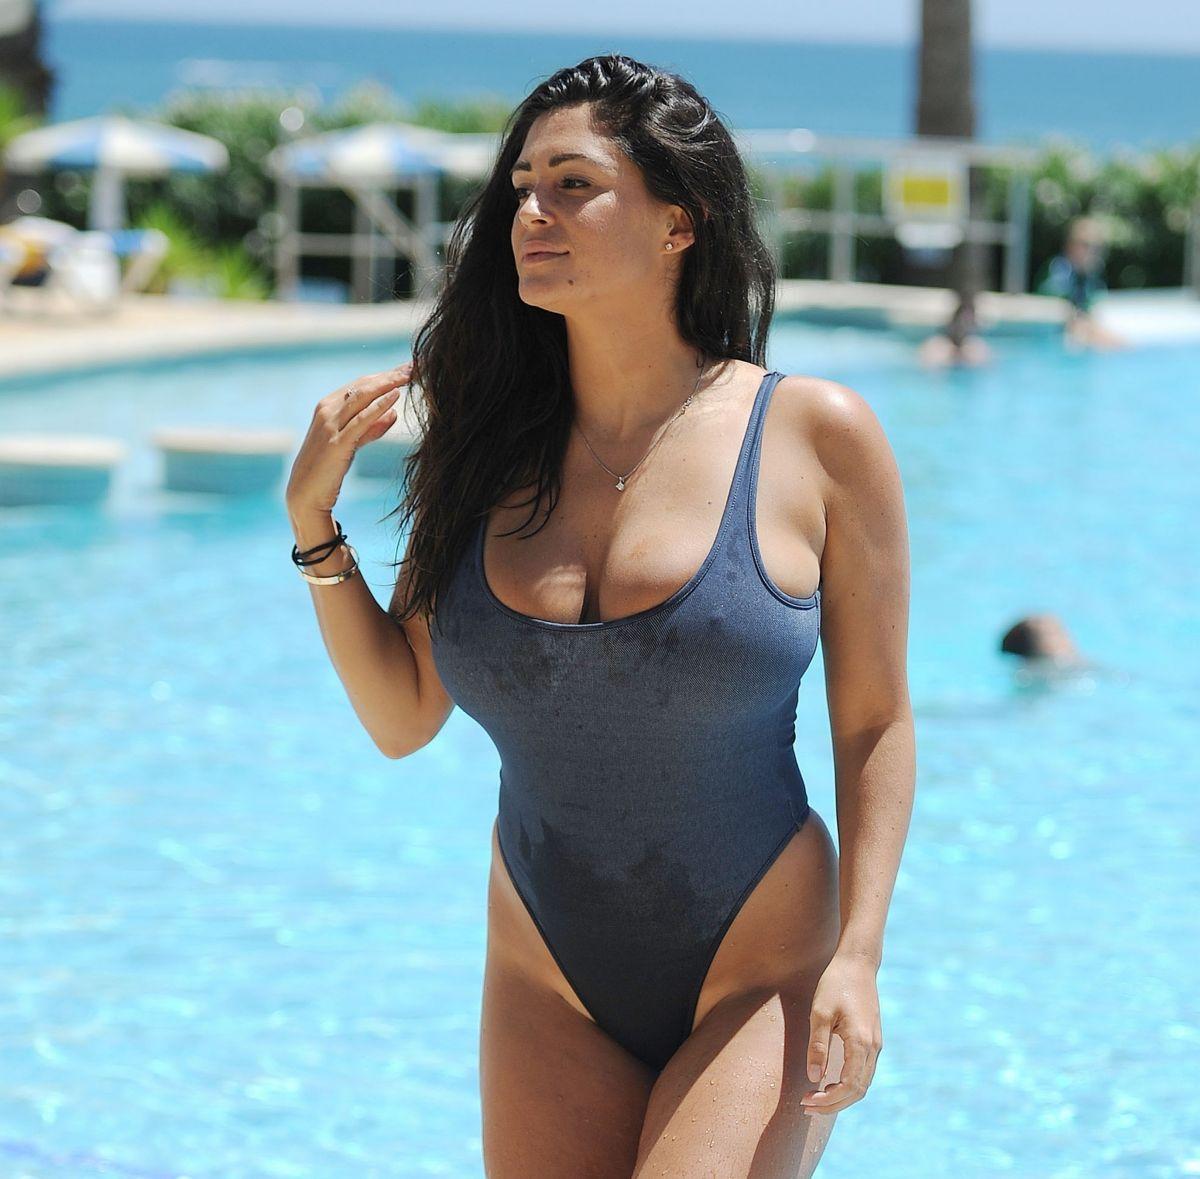 CASEY BATCHELOR in Bikini ata Pool in Portugal 08/15/2017